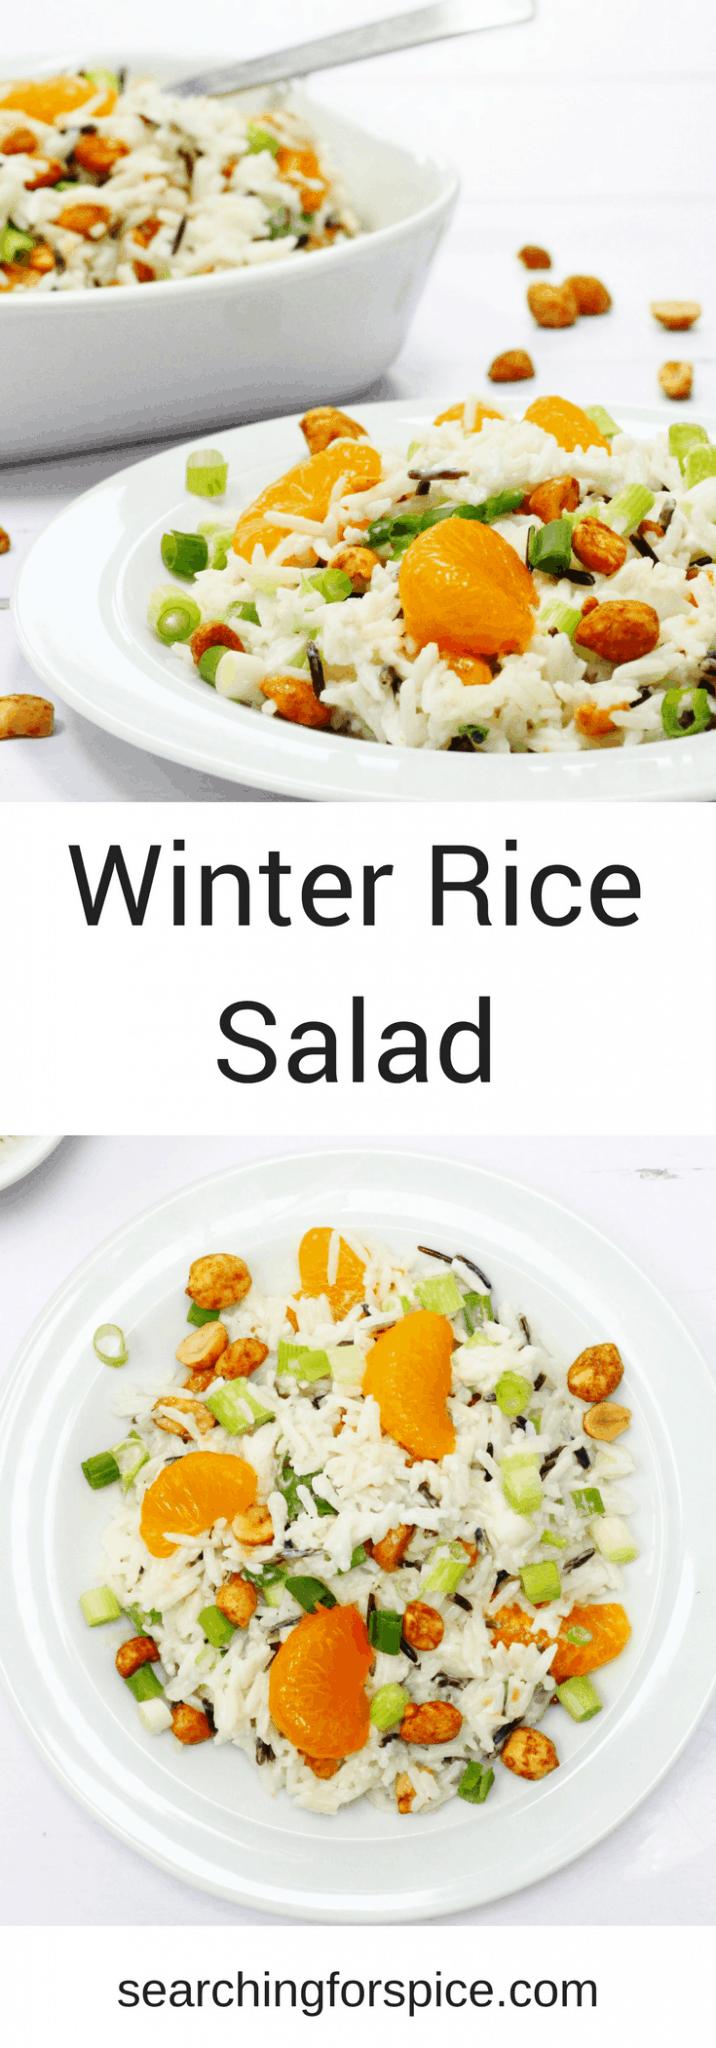 Winter rice salad with dry roasted peanuts, mandarins and spring onions #salad #ricesalad #recipe #mandarinoranges s #sidedish #vegetarian